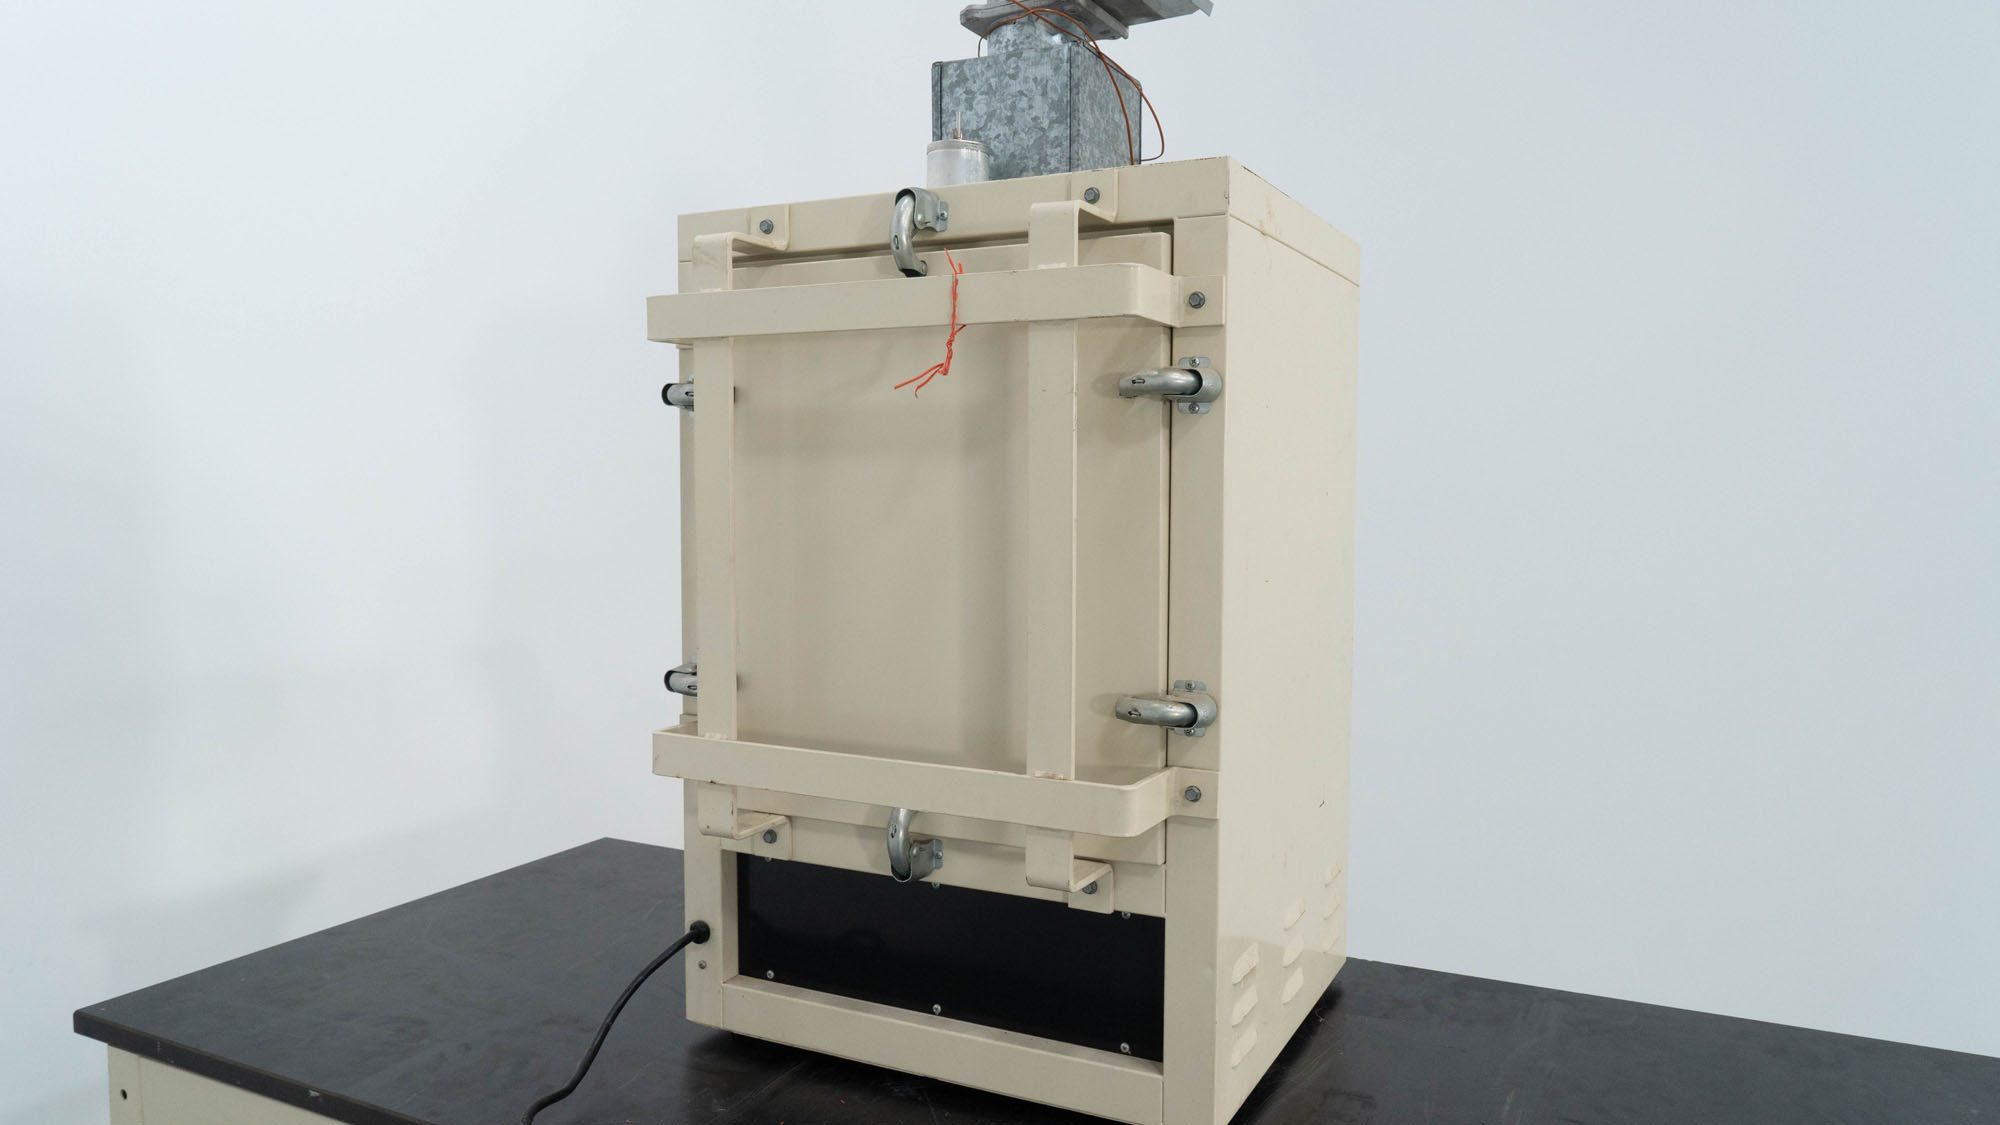 VWR Lab Oven, Model 1330